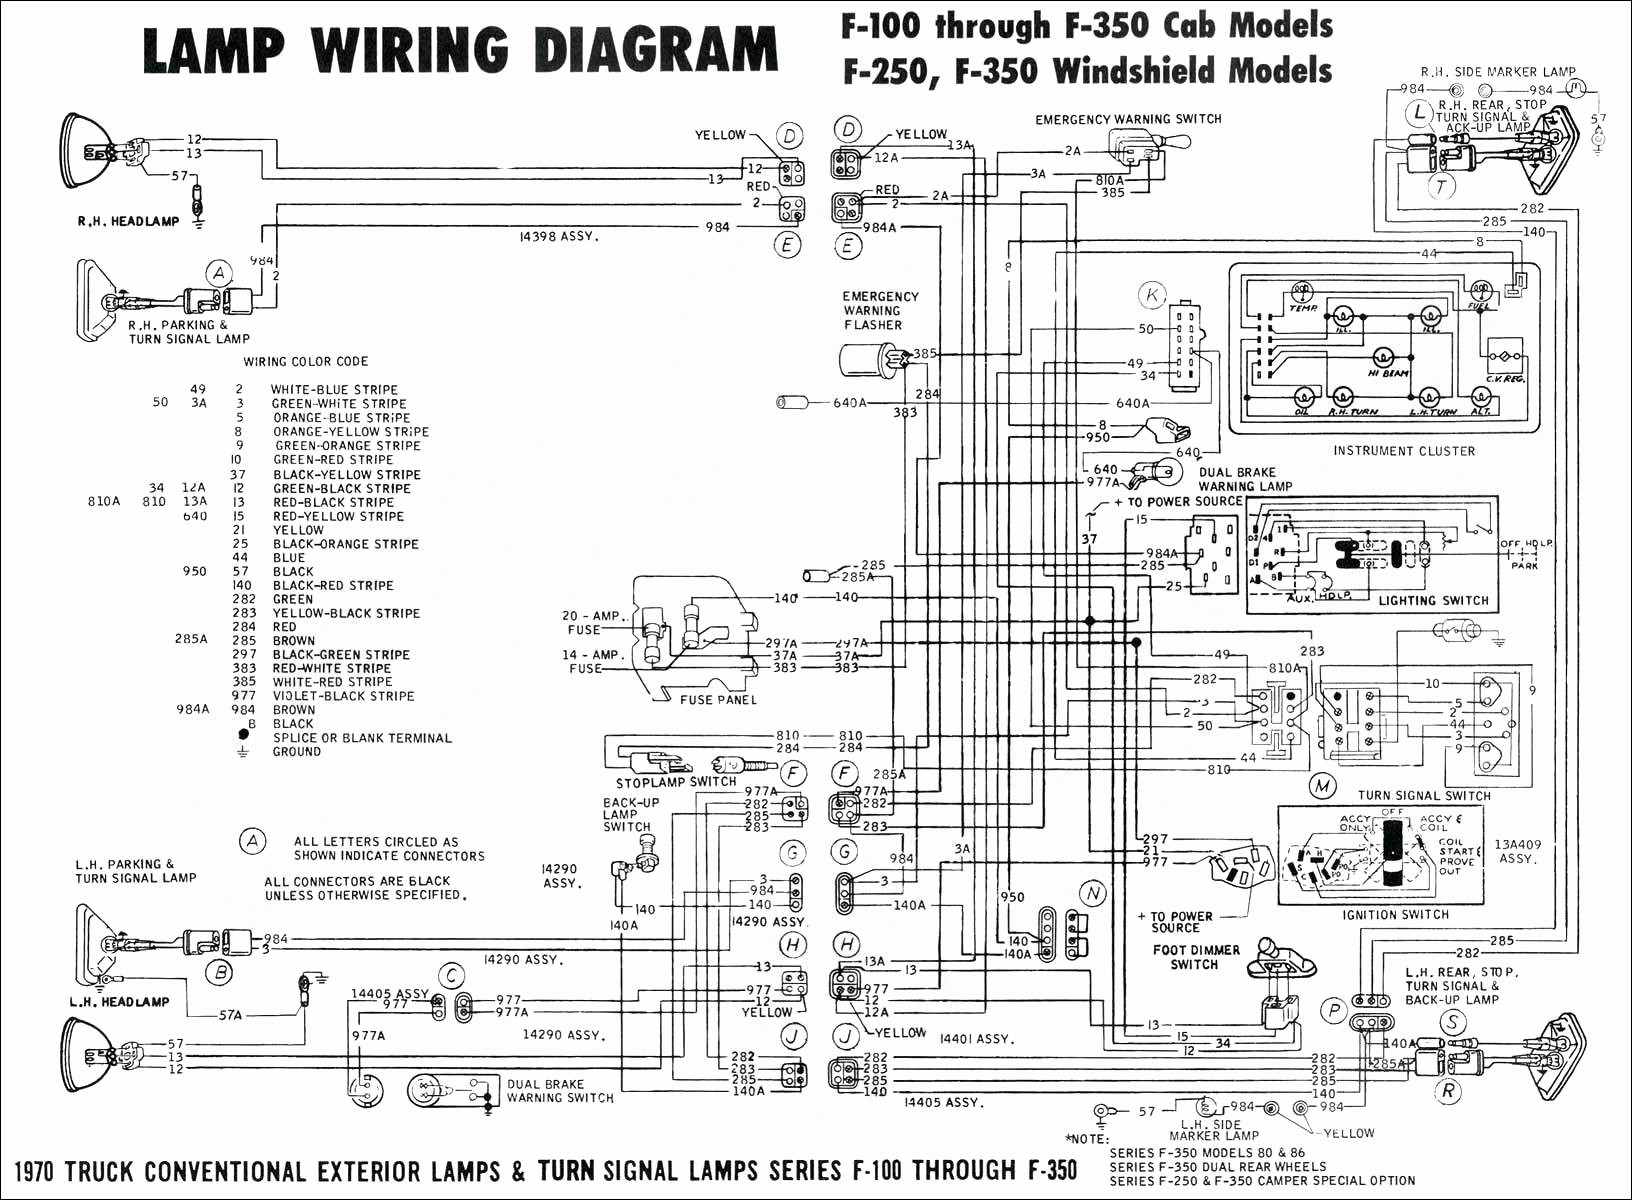 Kib Tank Monitor Instructions Monitor Panel K21 Wiring Diagram Of Kib Tank Monitor Instructions